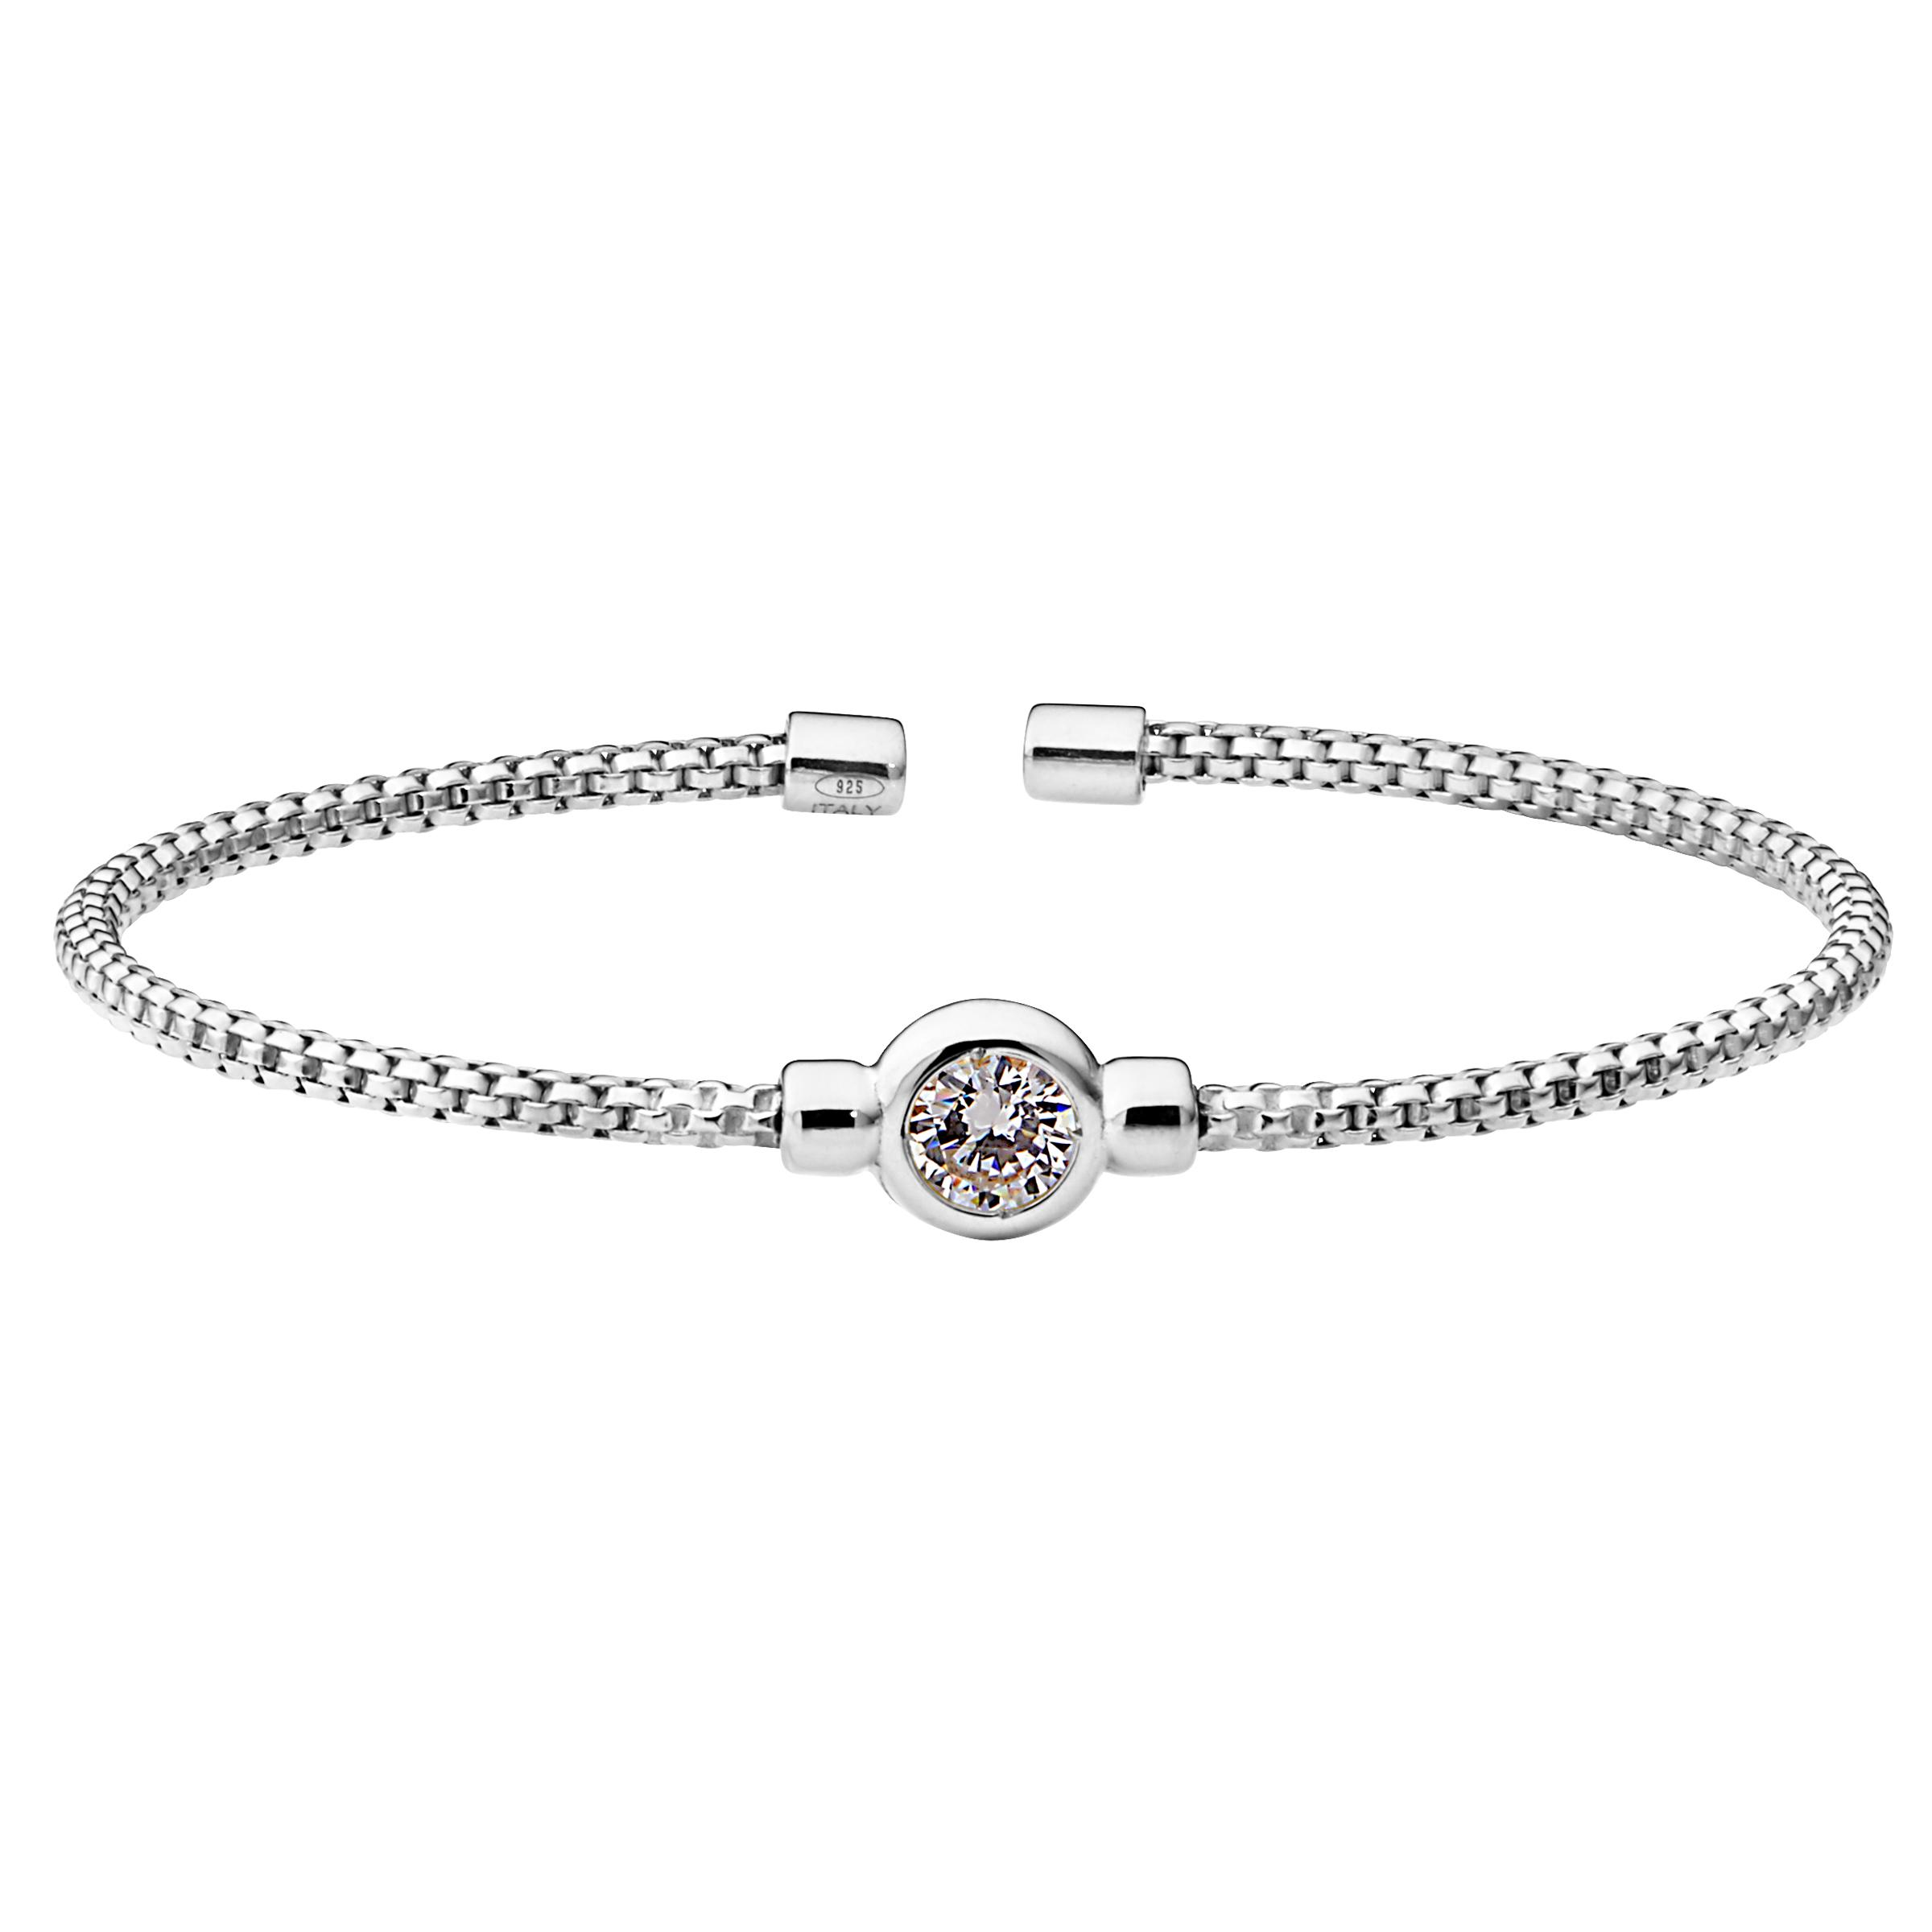 Bella Cavo White Stone Bracelet